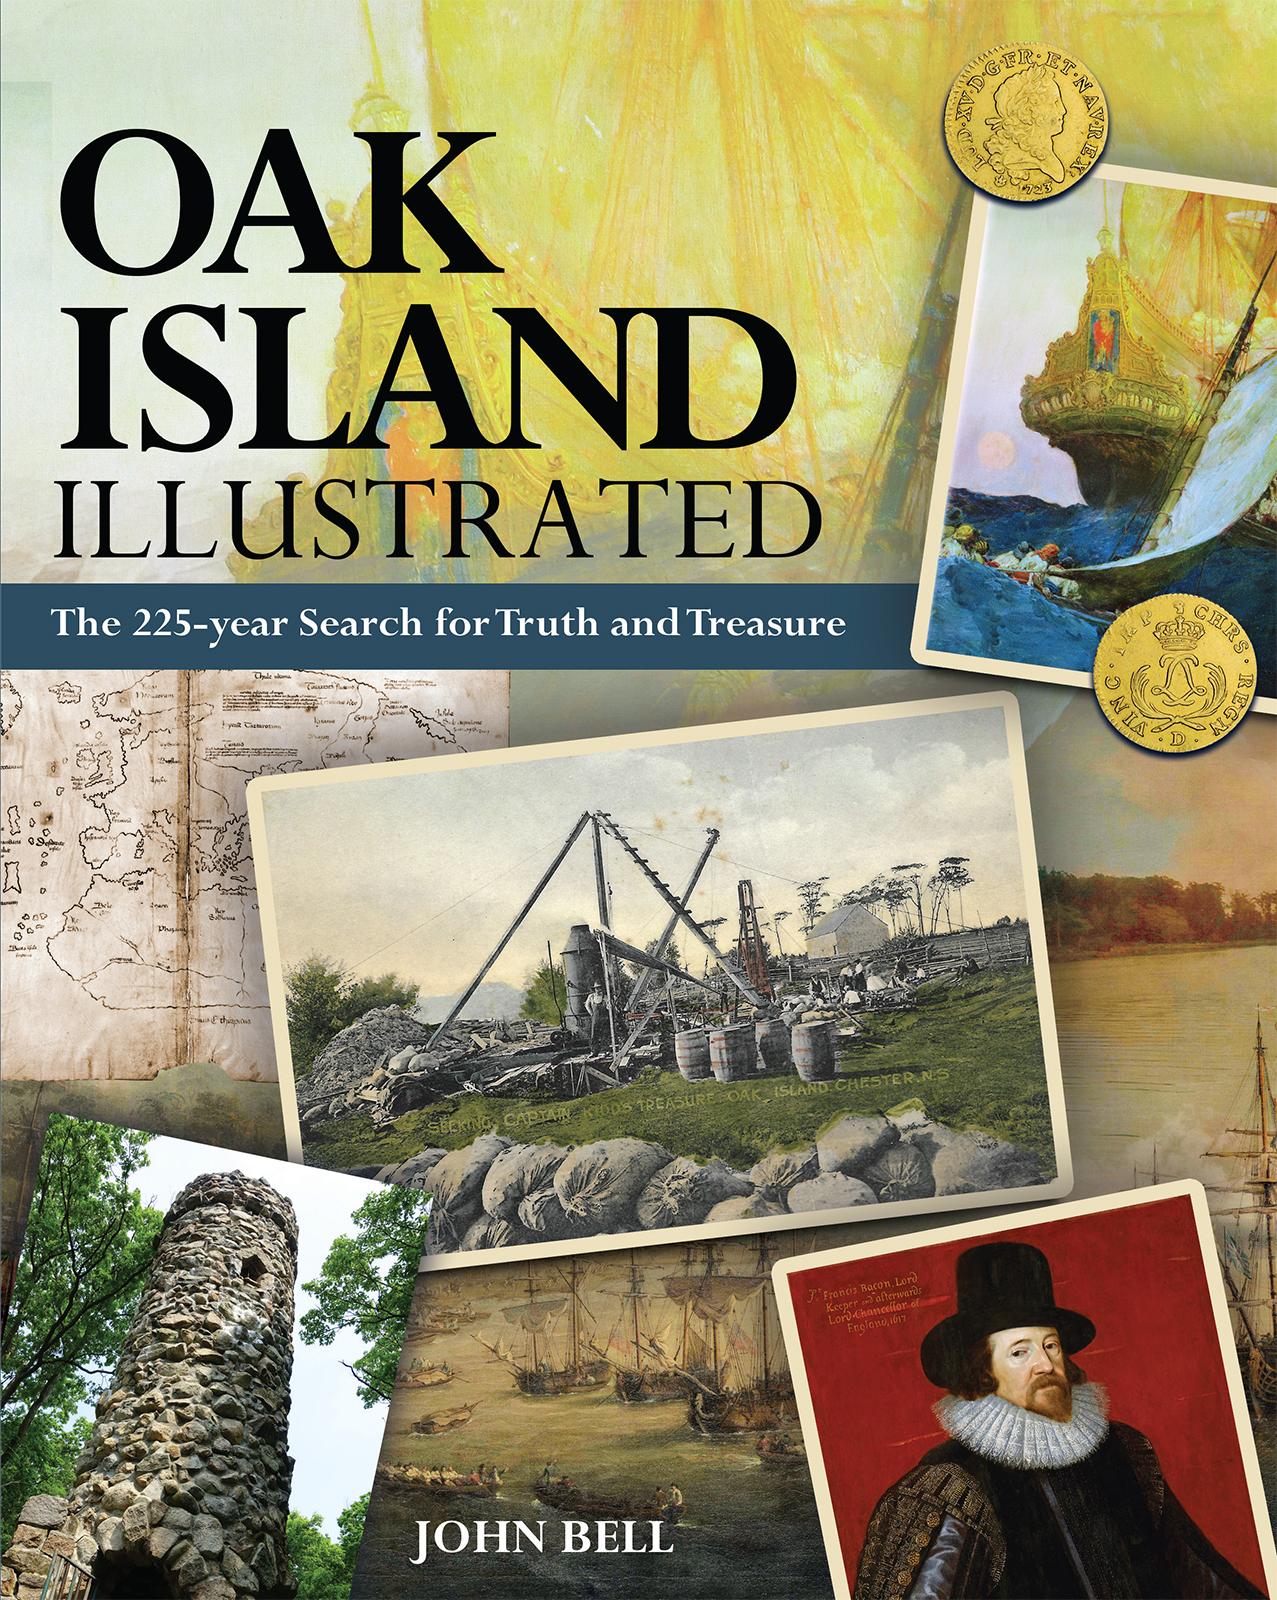 Oak Island Illustrated